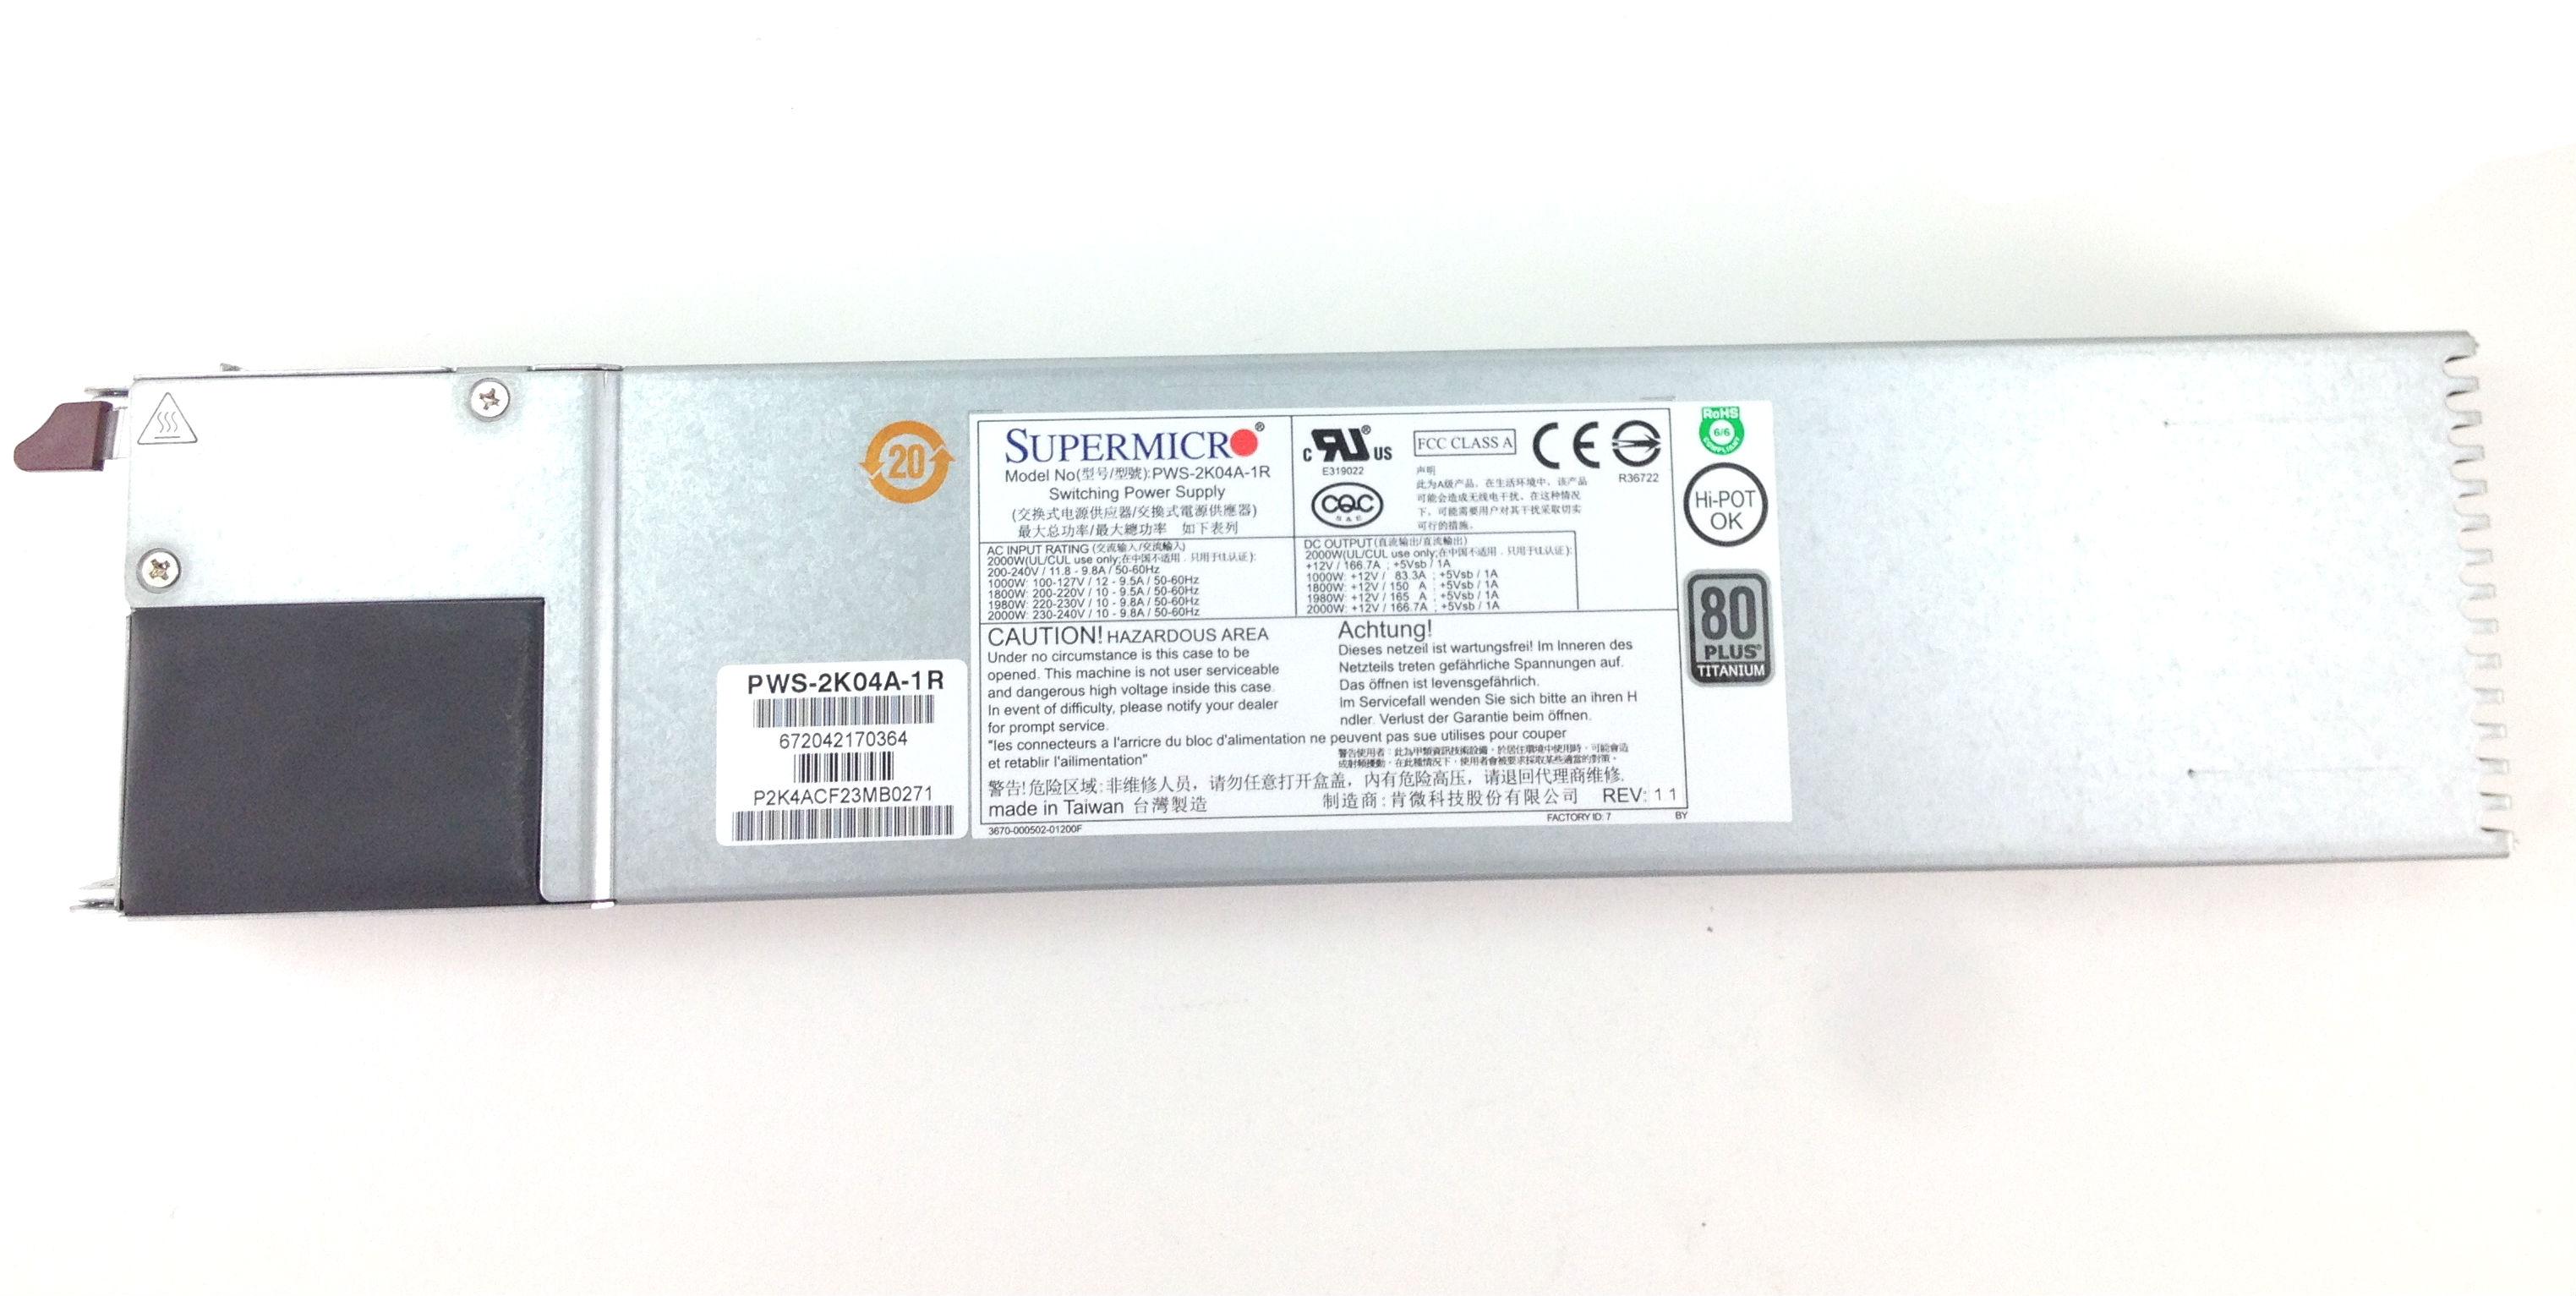 Supermicro 2000W Redundant Hot Swap Power Supply (PWS-2K04A-1R)